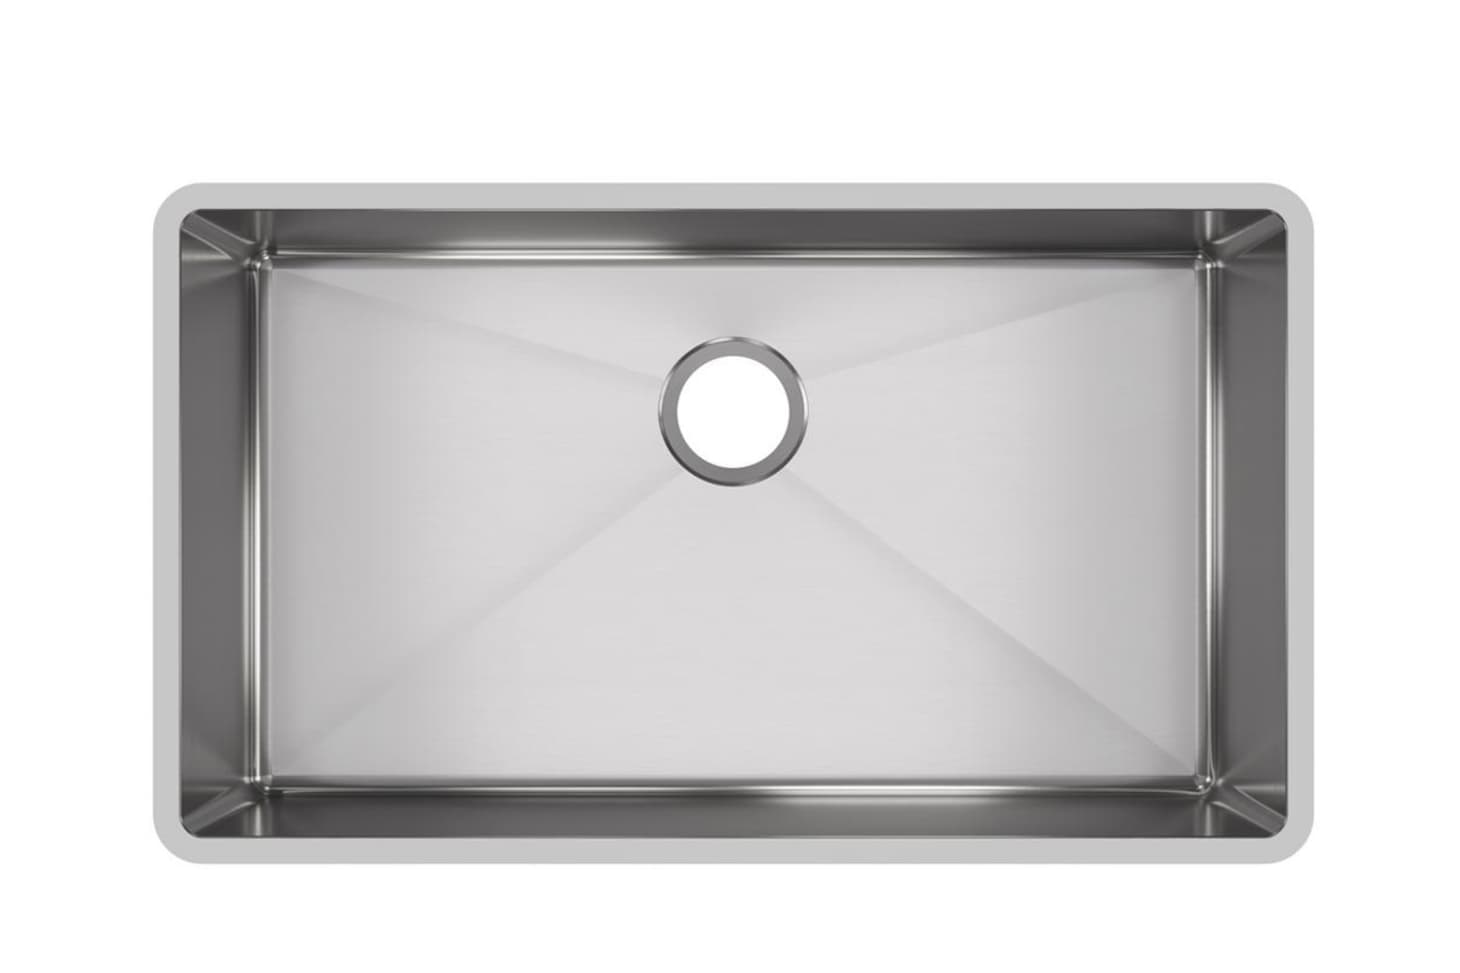 Inexpensive Kitchen Sinks | Kitchn